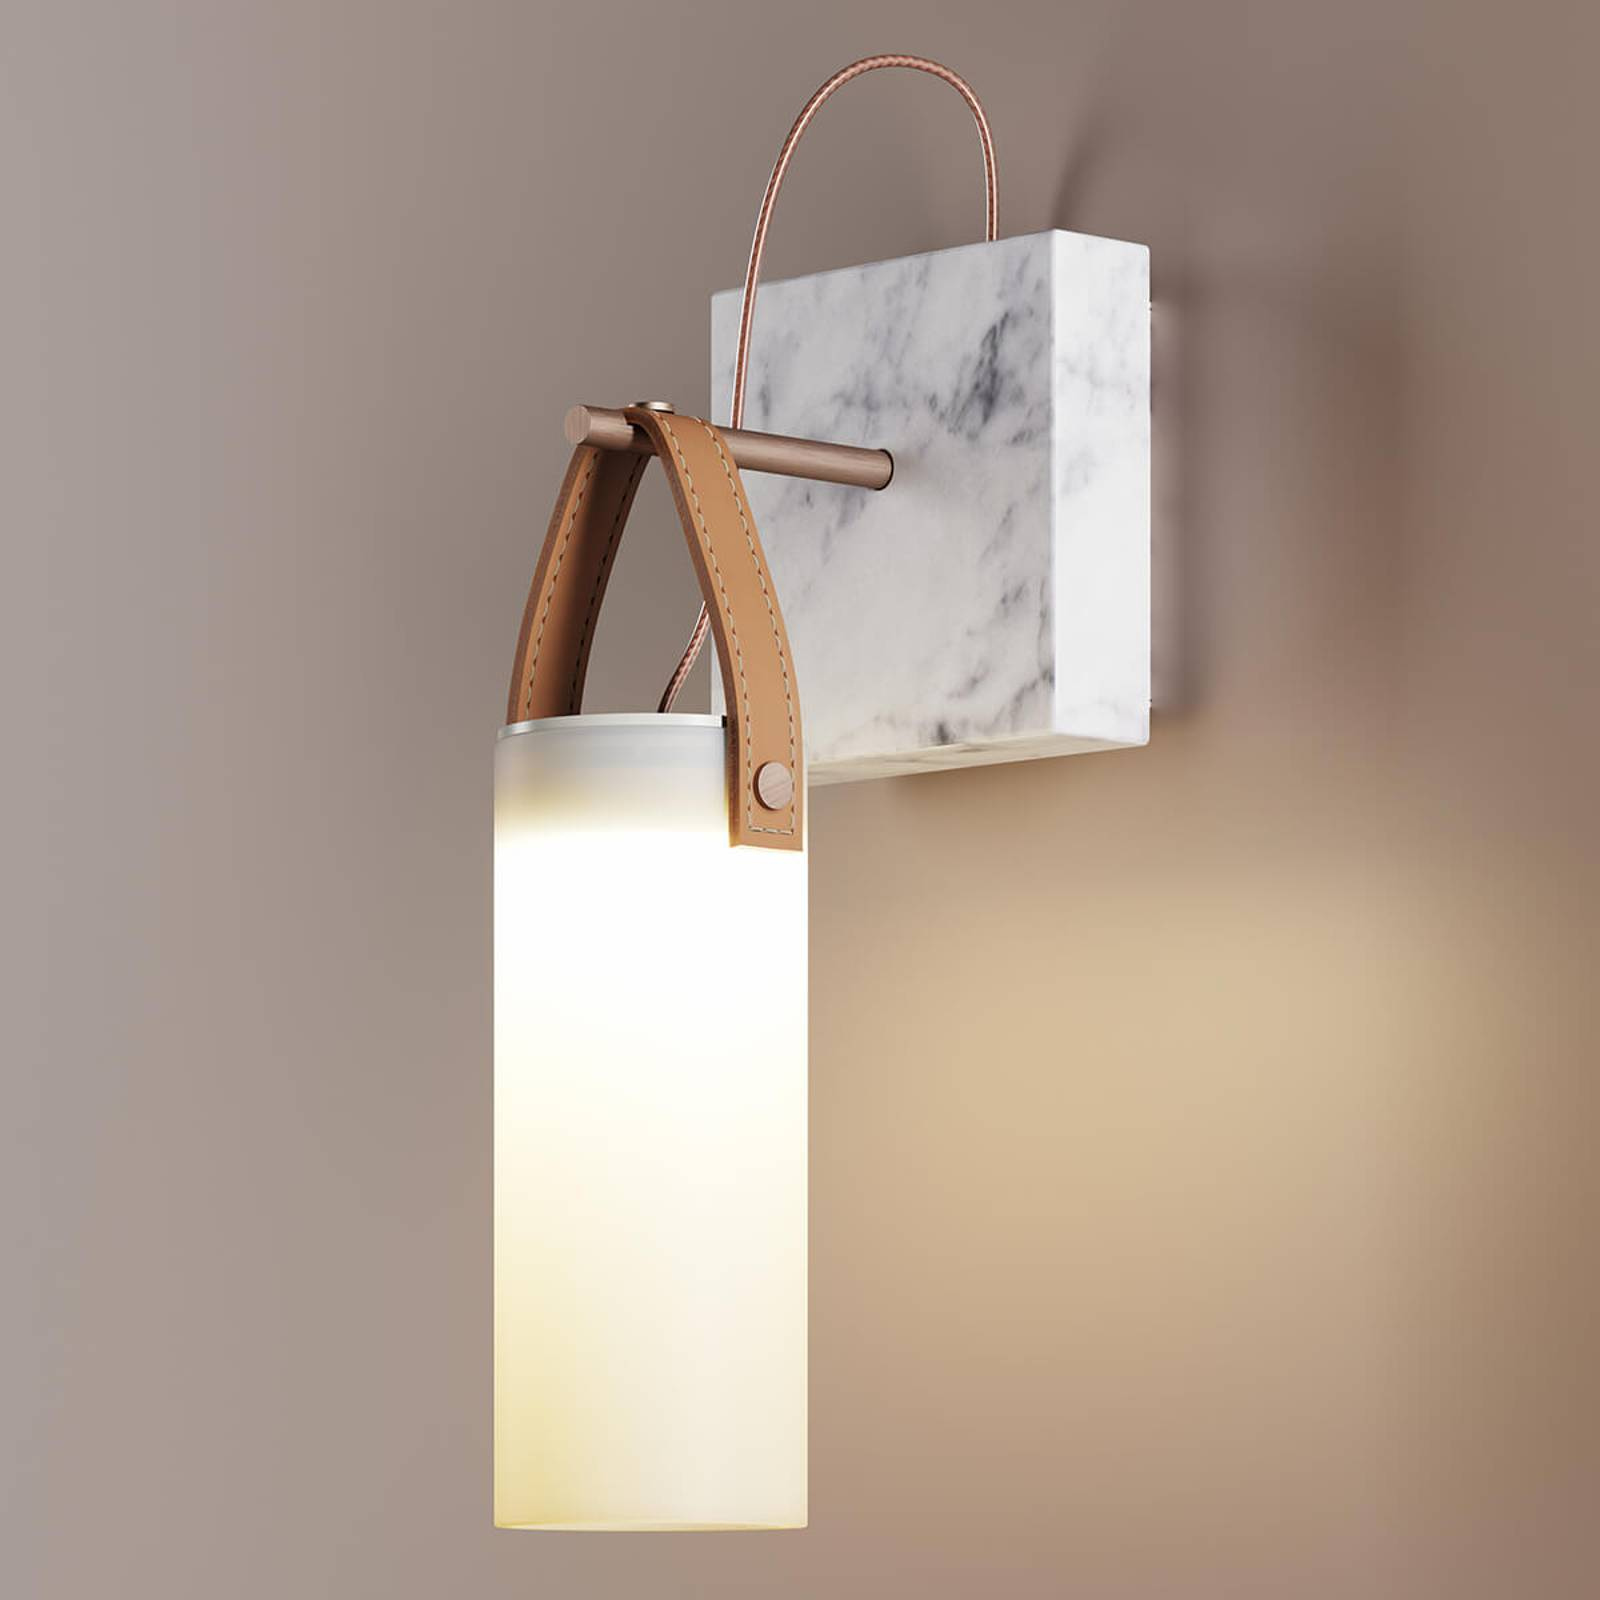 Fontana Arte Galerie -design-LED-seinävalaisin